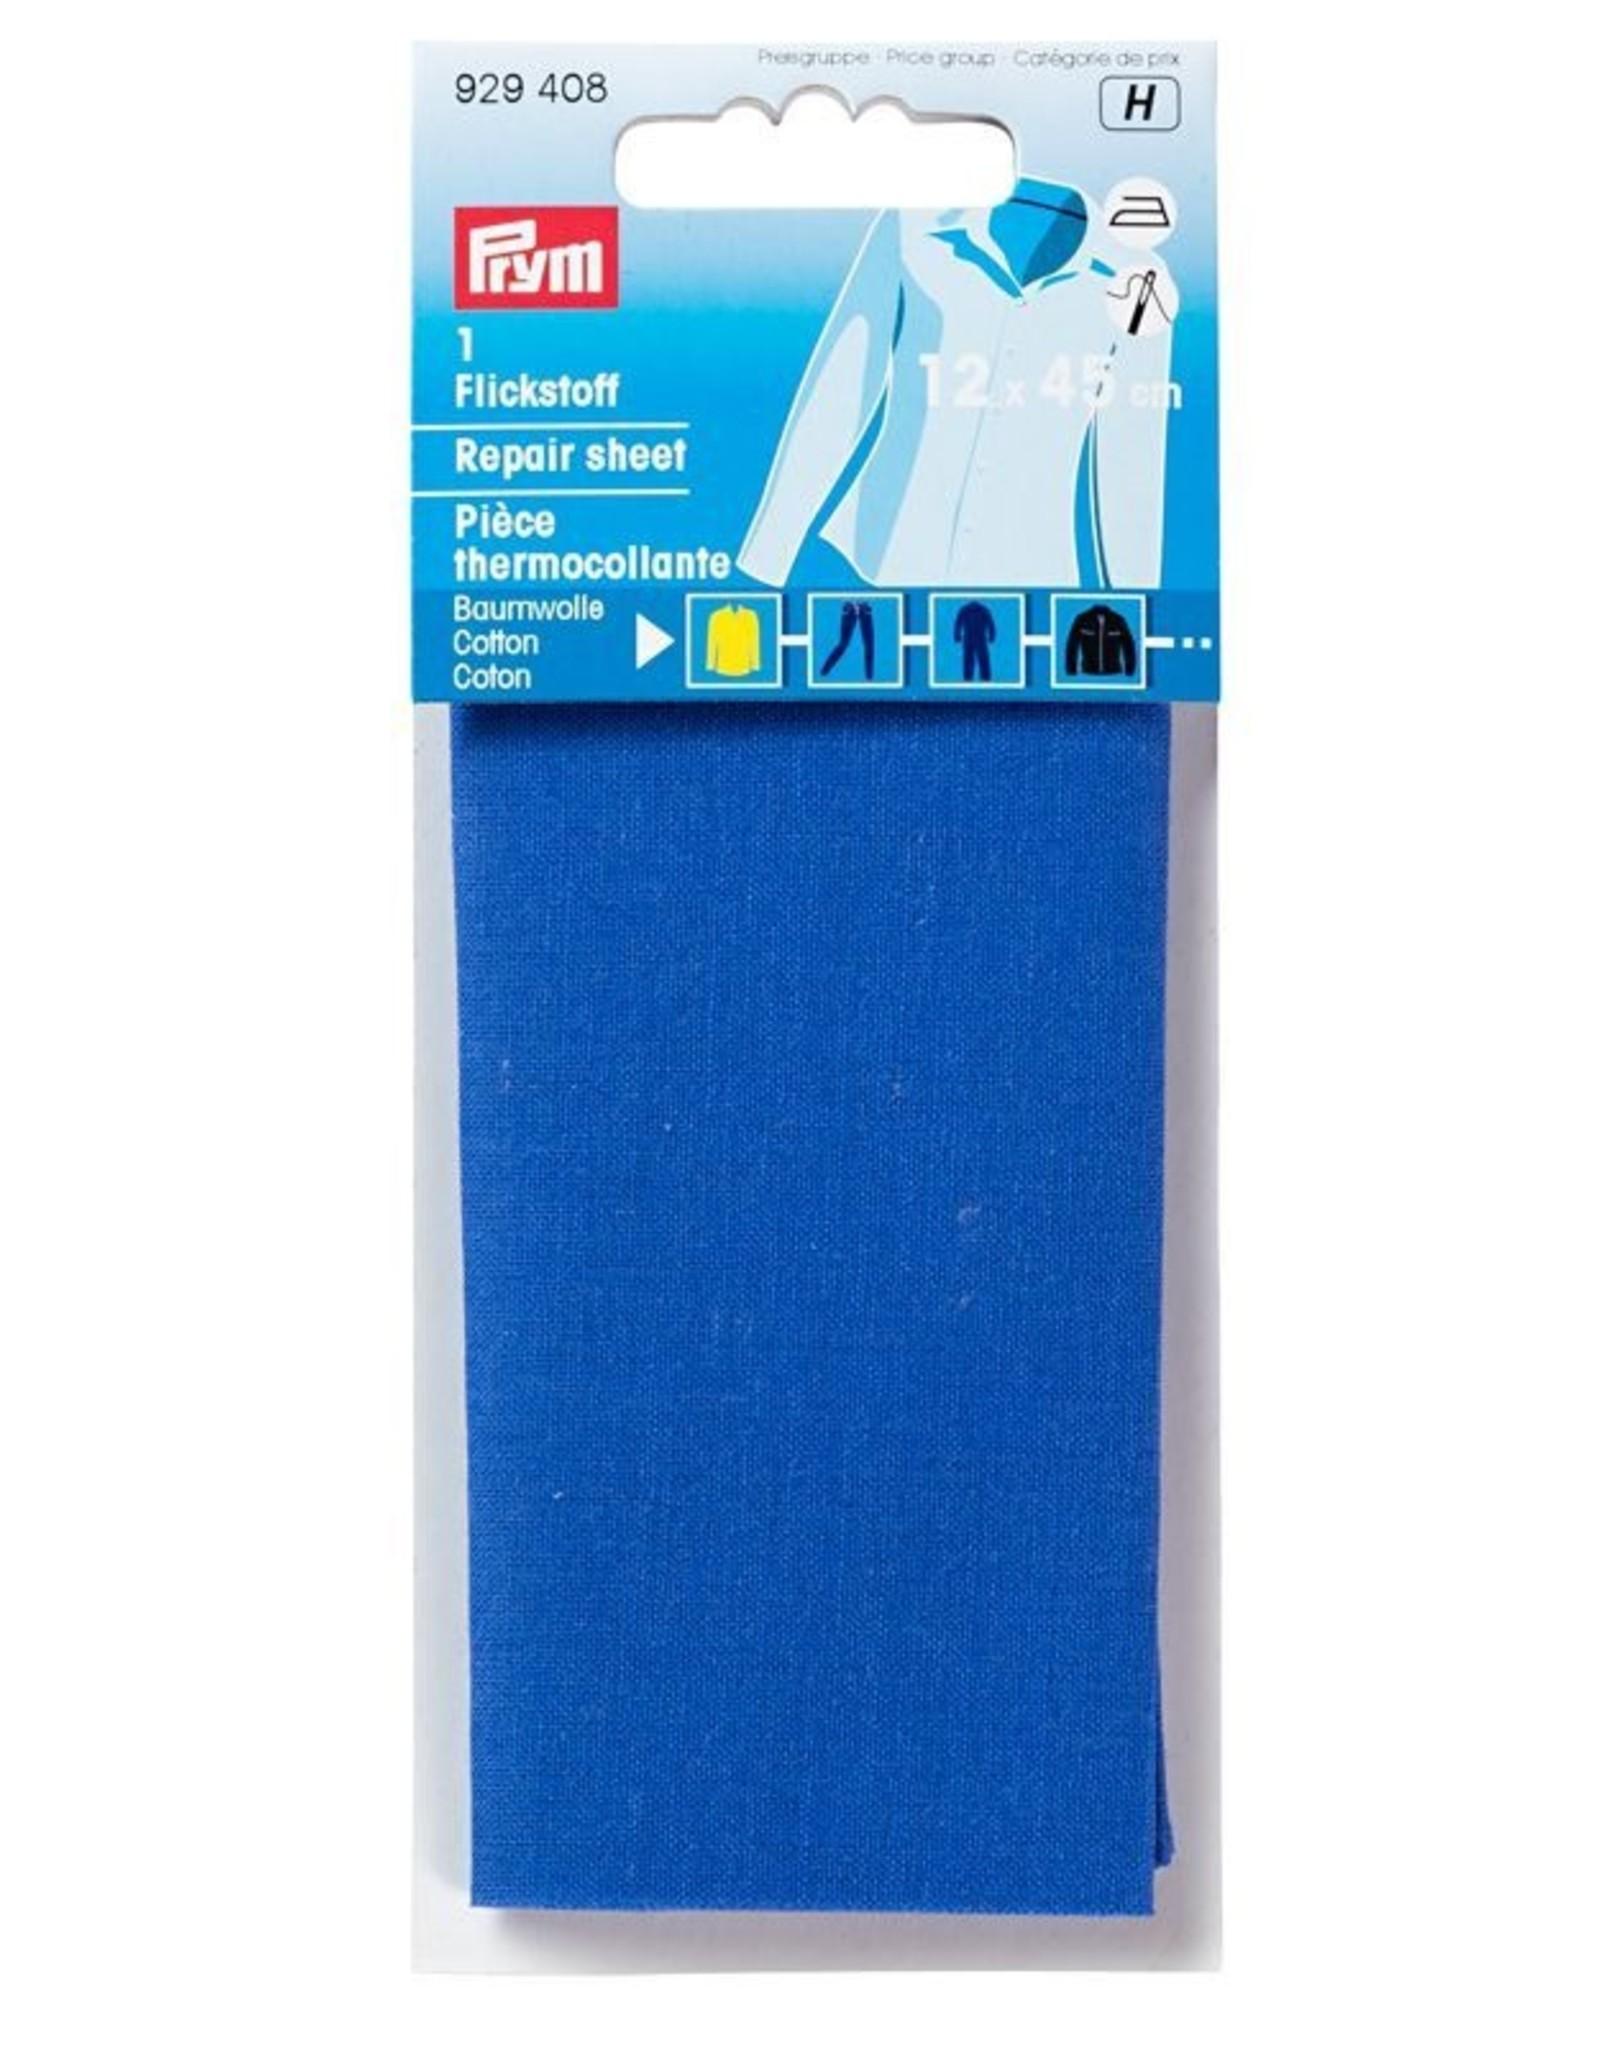 Prym prym - verstelstuk katoen blauw 12x45 cm - 929 408